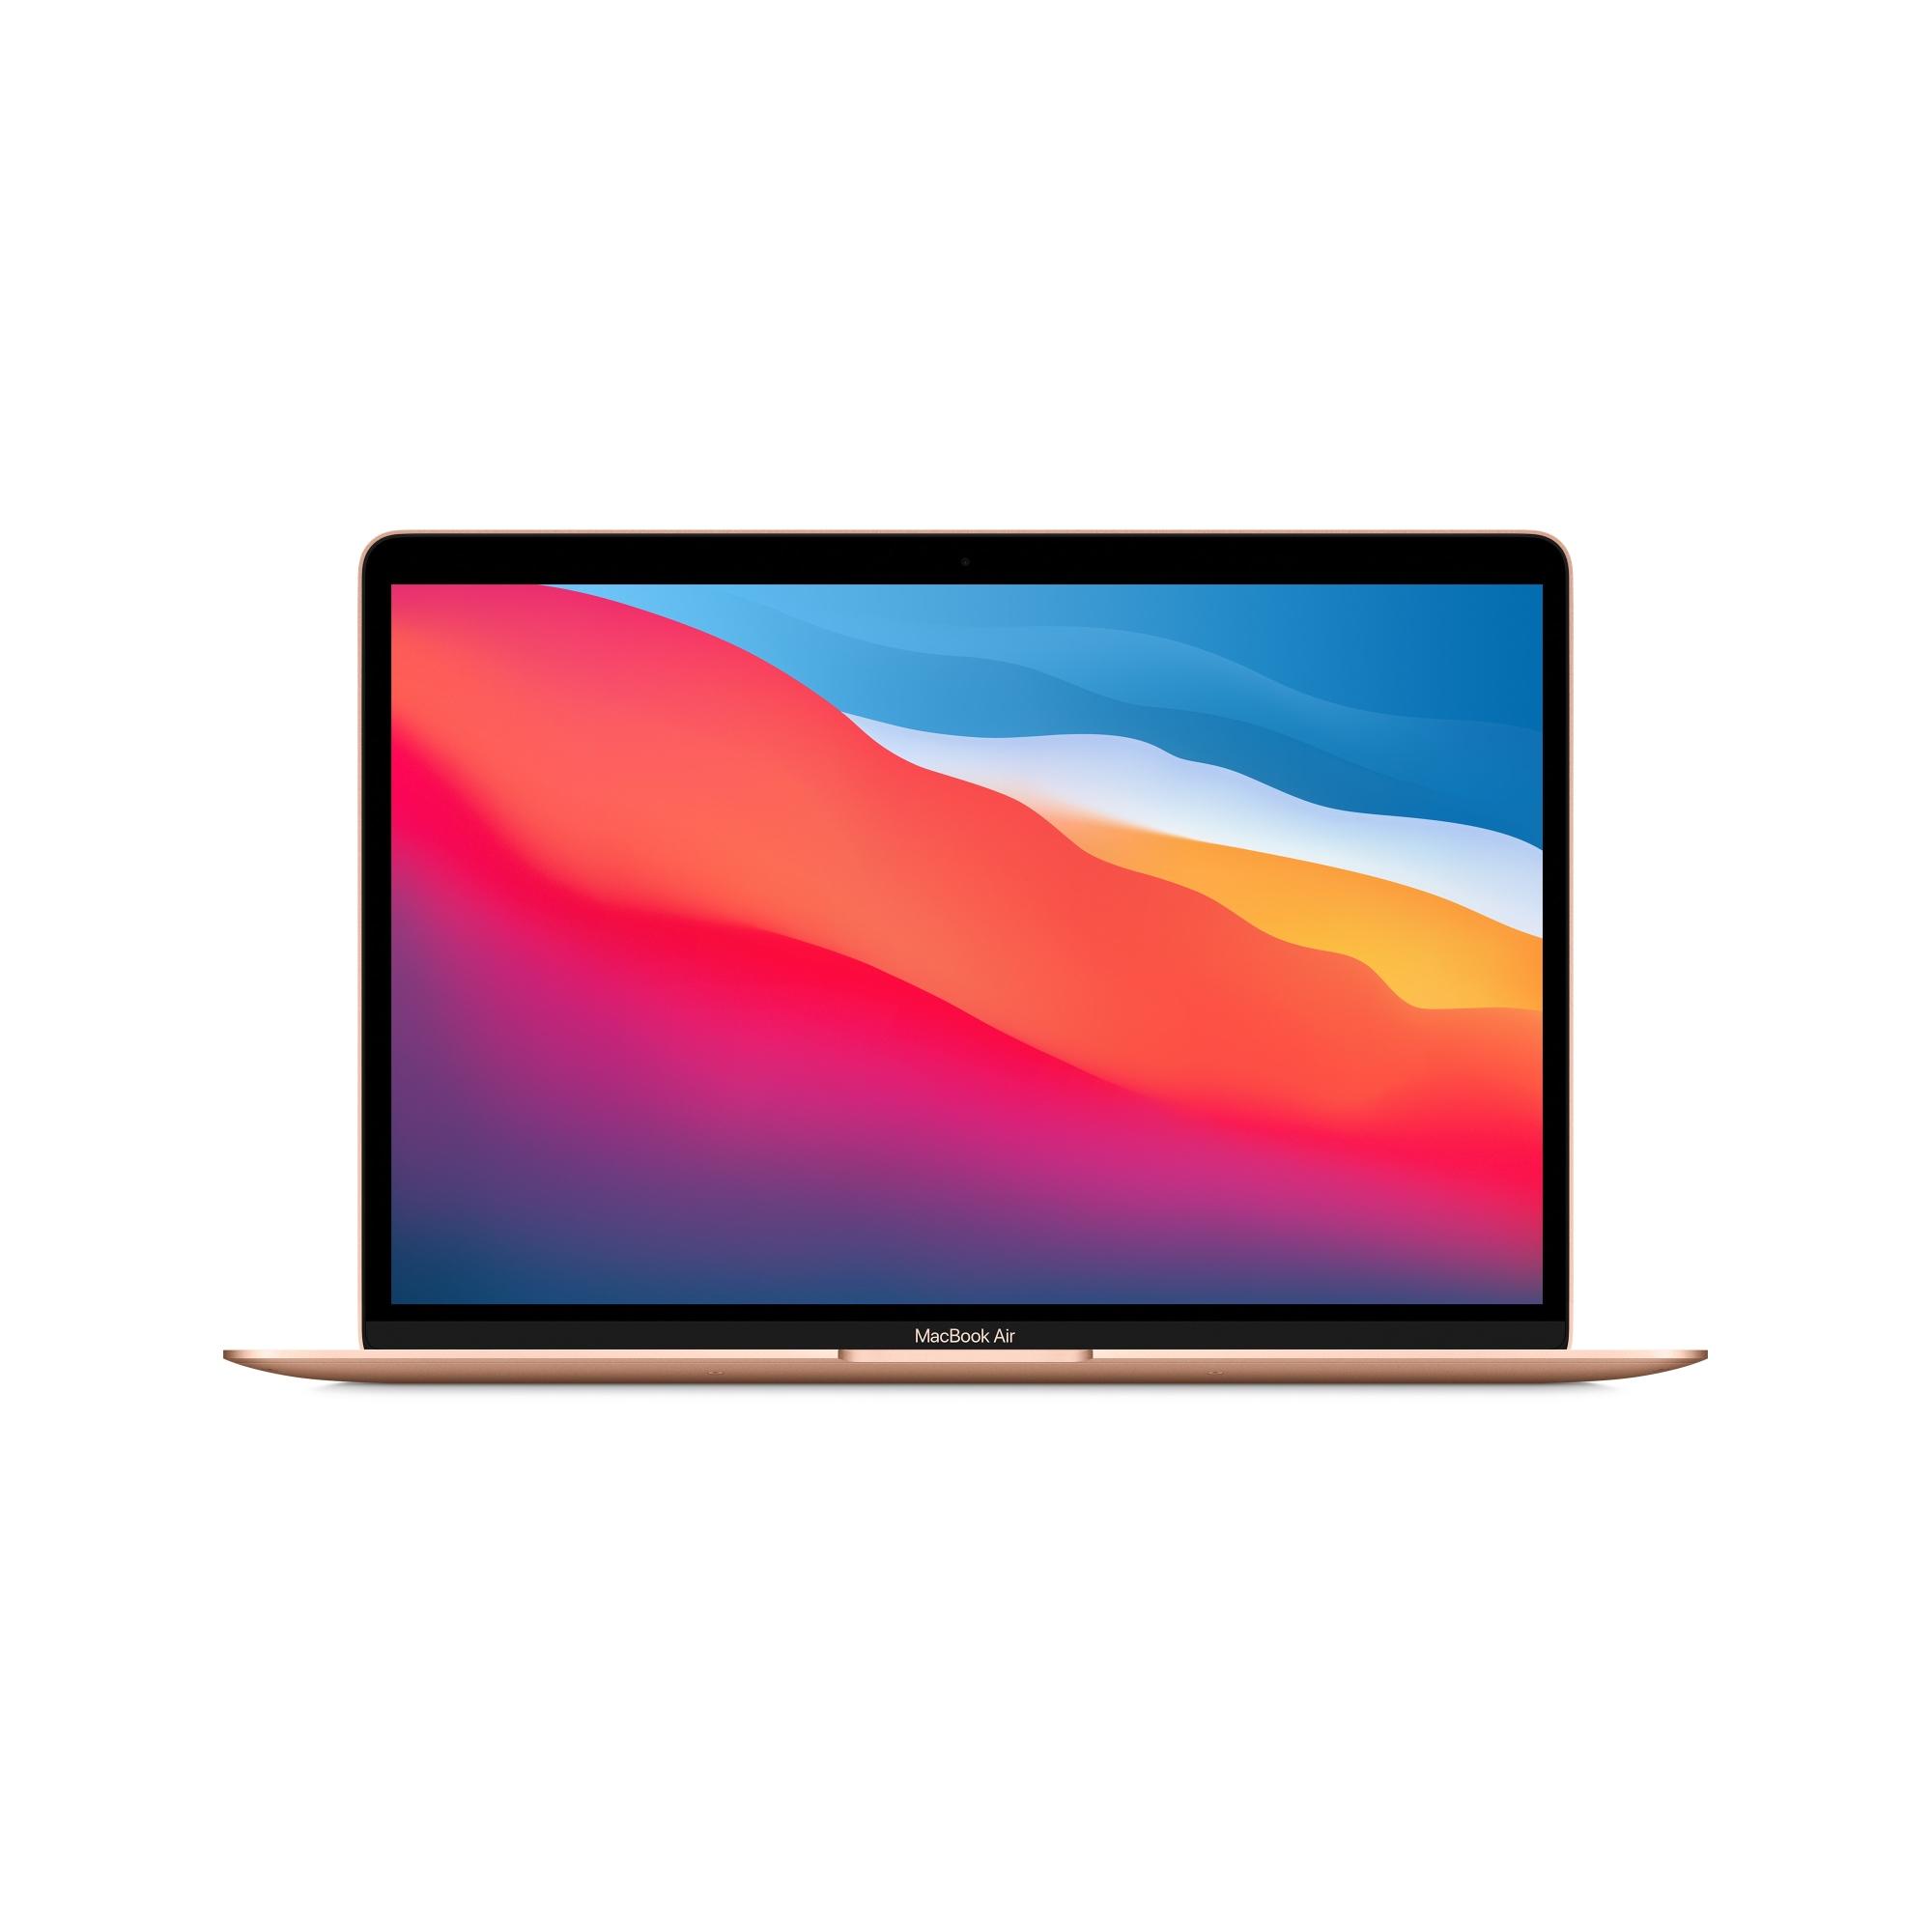 Macbook Air Portátil 33,8 Cm (13.3) 2560 X 1600 Pixeles Apple M 8 Gb 512 Gb Ssd Wi-fi 6 (802.11ax) Macos Big Sur Oro